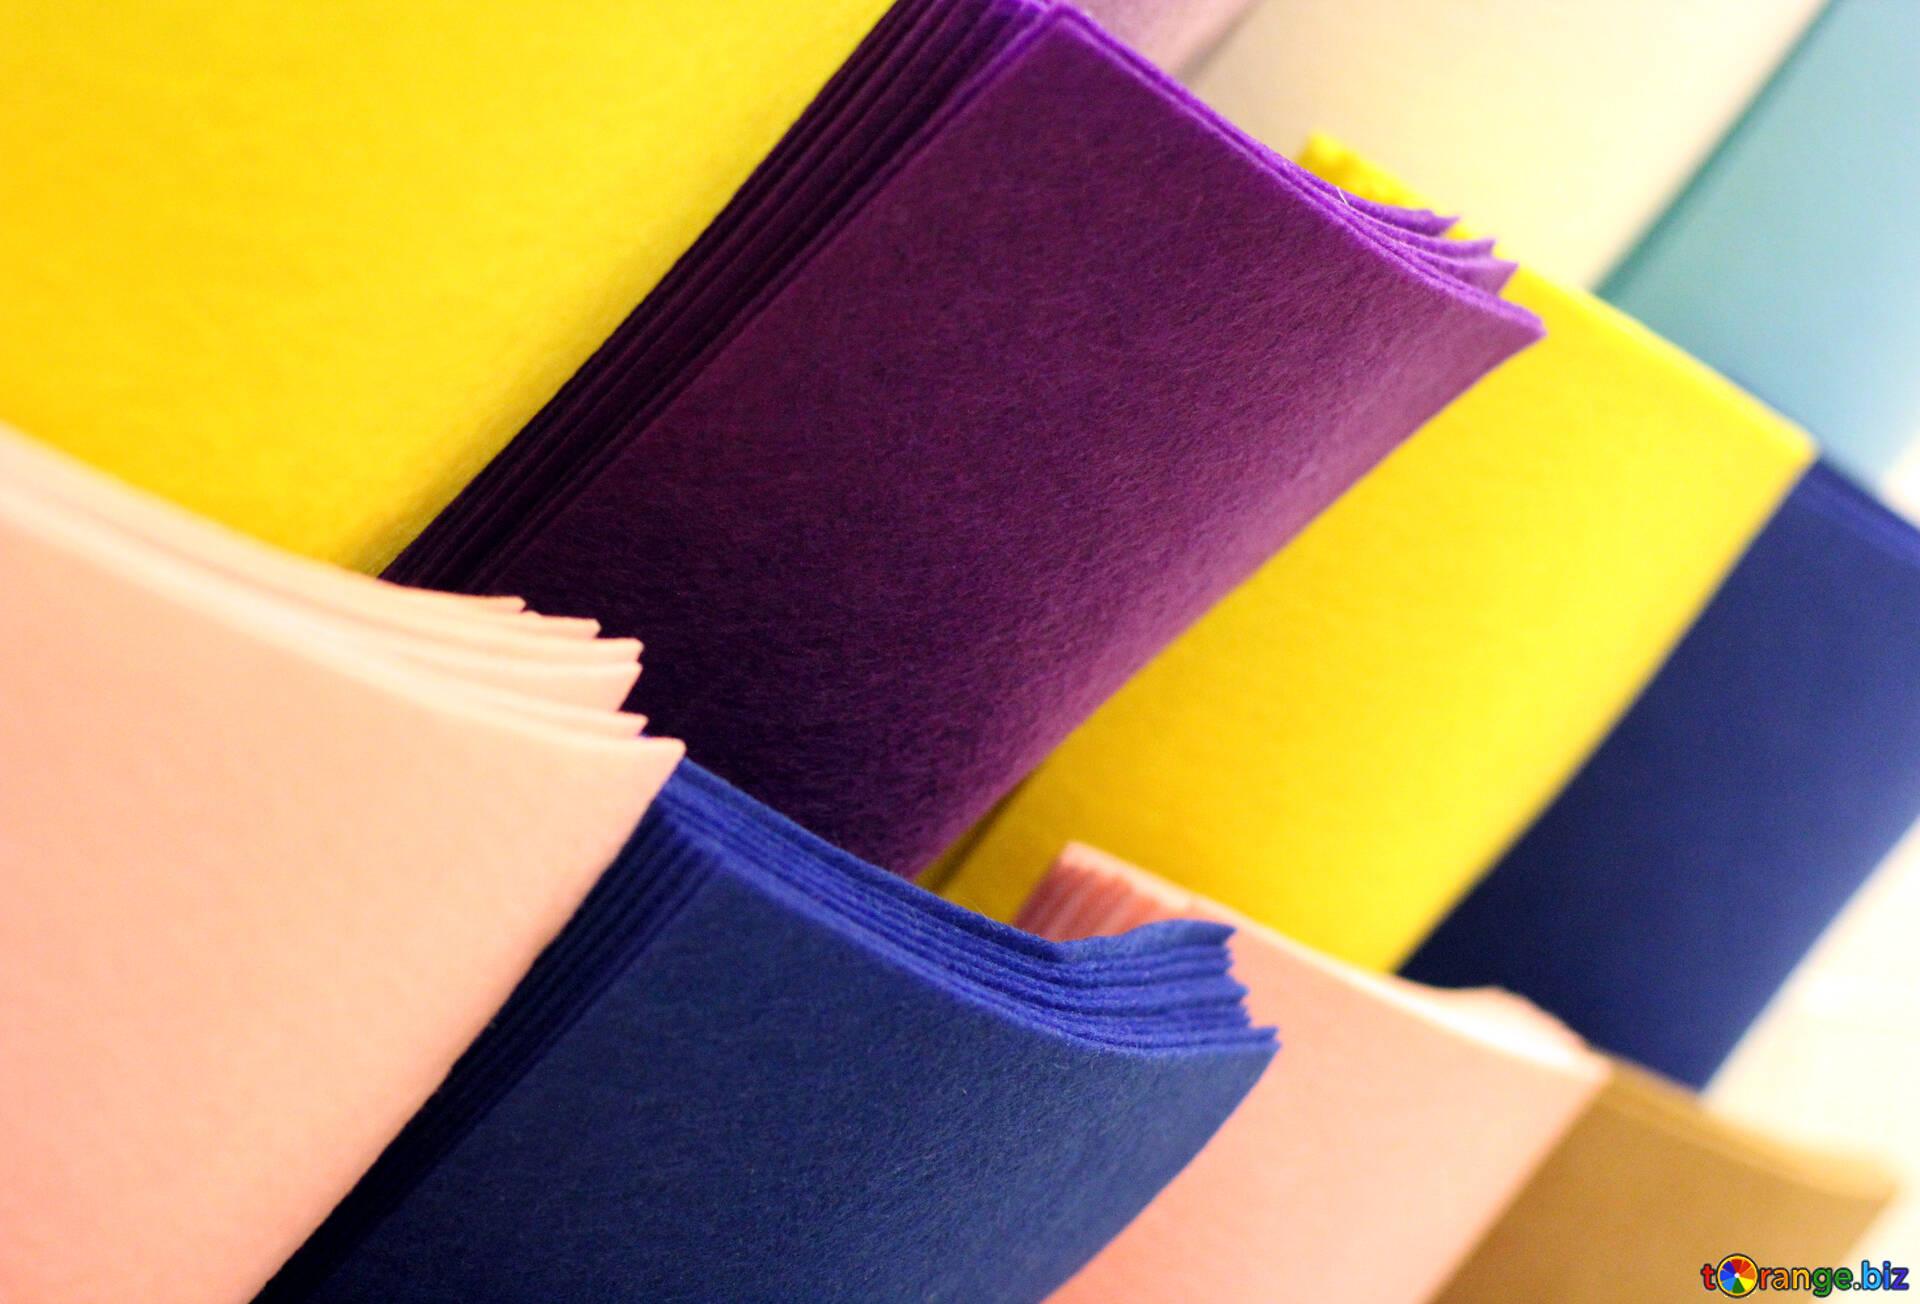 Stoff Texturen Farbiger Filz Quadriert Papierstoff Muster 49152